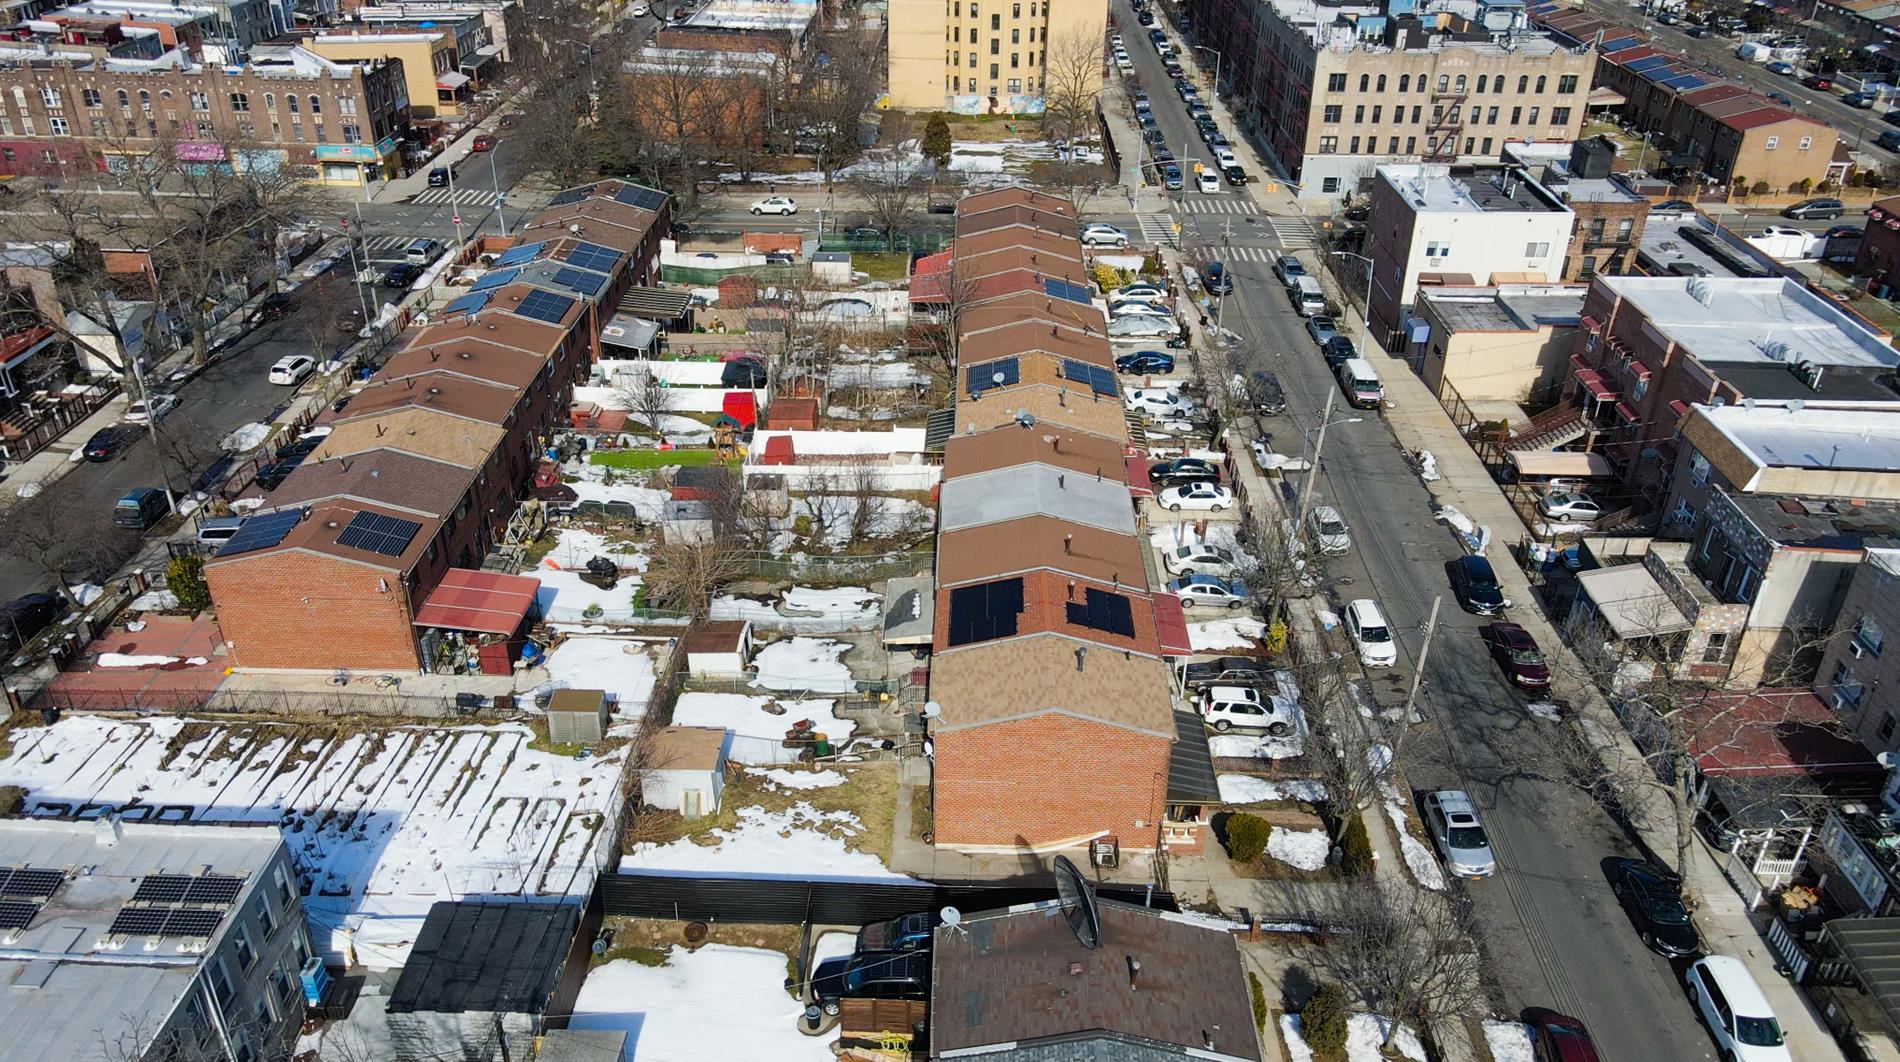 254 Amboy Street Brownsville Brooklyn NY 11212